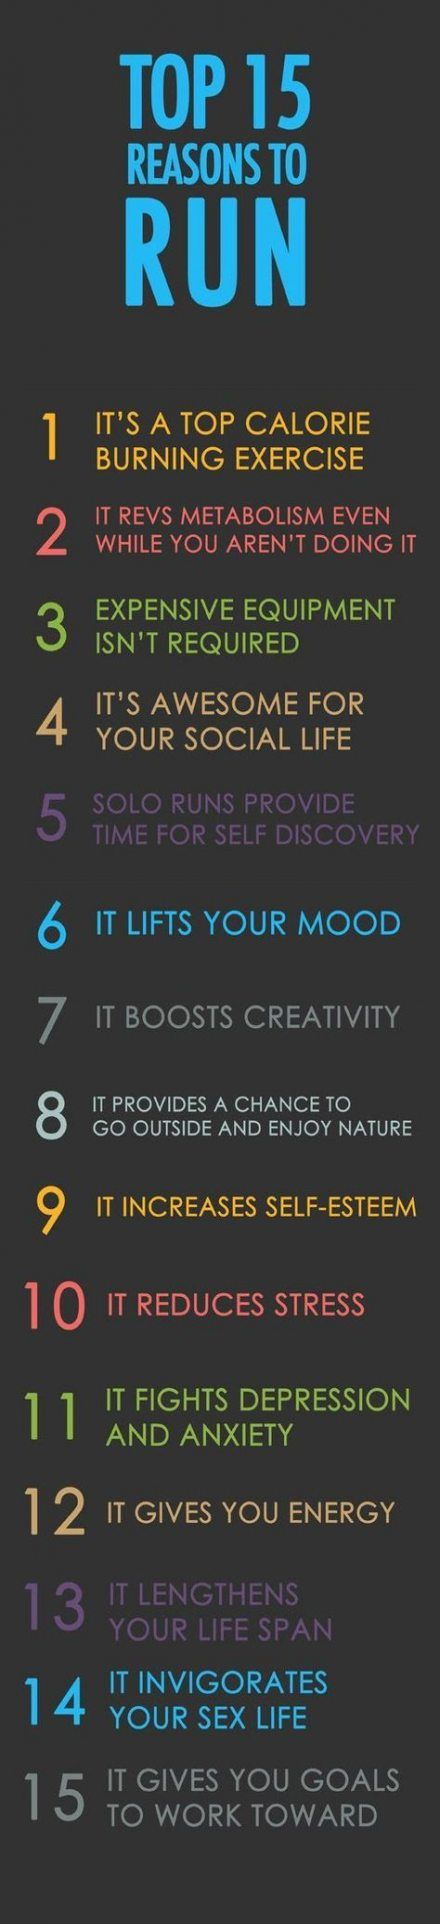 Fitness Motivation Diet Running 51+ Ideas For 2019 #motivation #fitness #diet